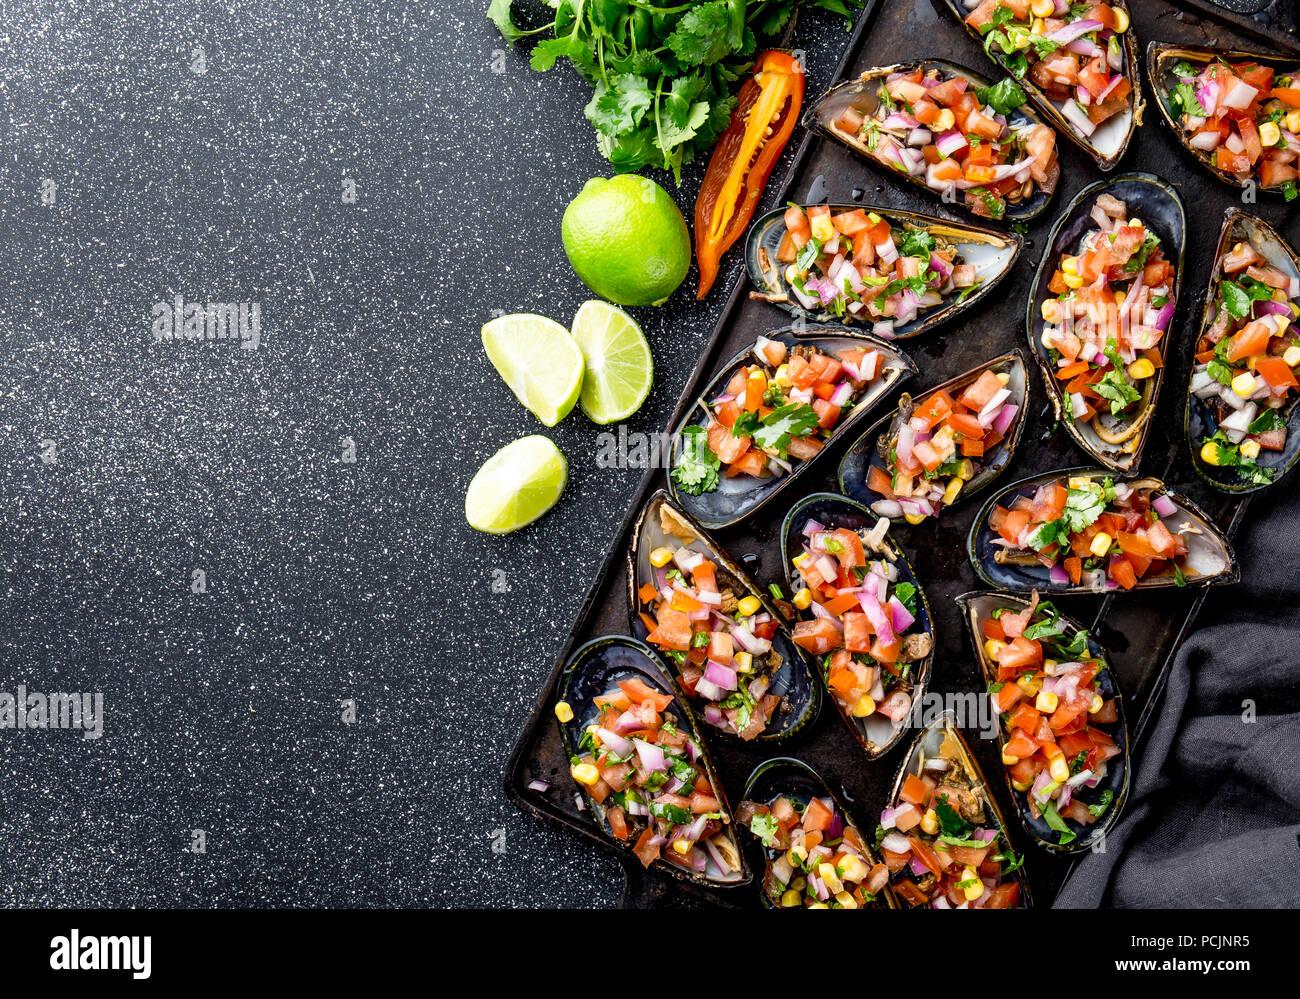 PERUVIAN FOOD. Choros a la chalaca. Big mussels, choros zapatos seasoned with purple onion, tomatoes, corn and lemon. Top view, black background. Traditional peruvian dish - Stock Image